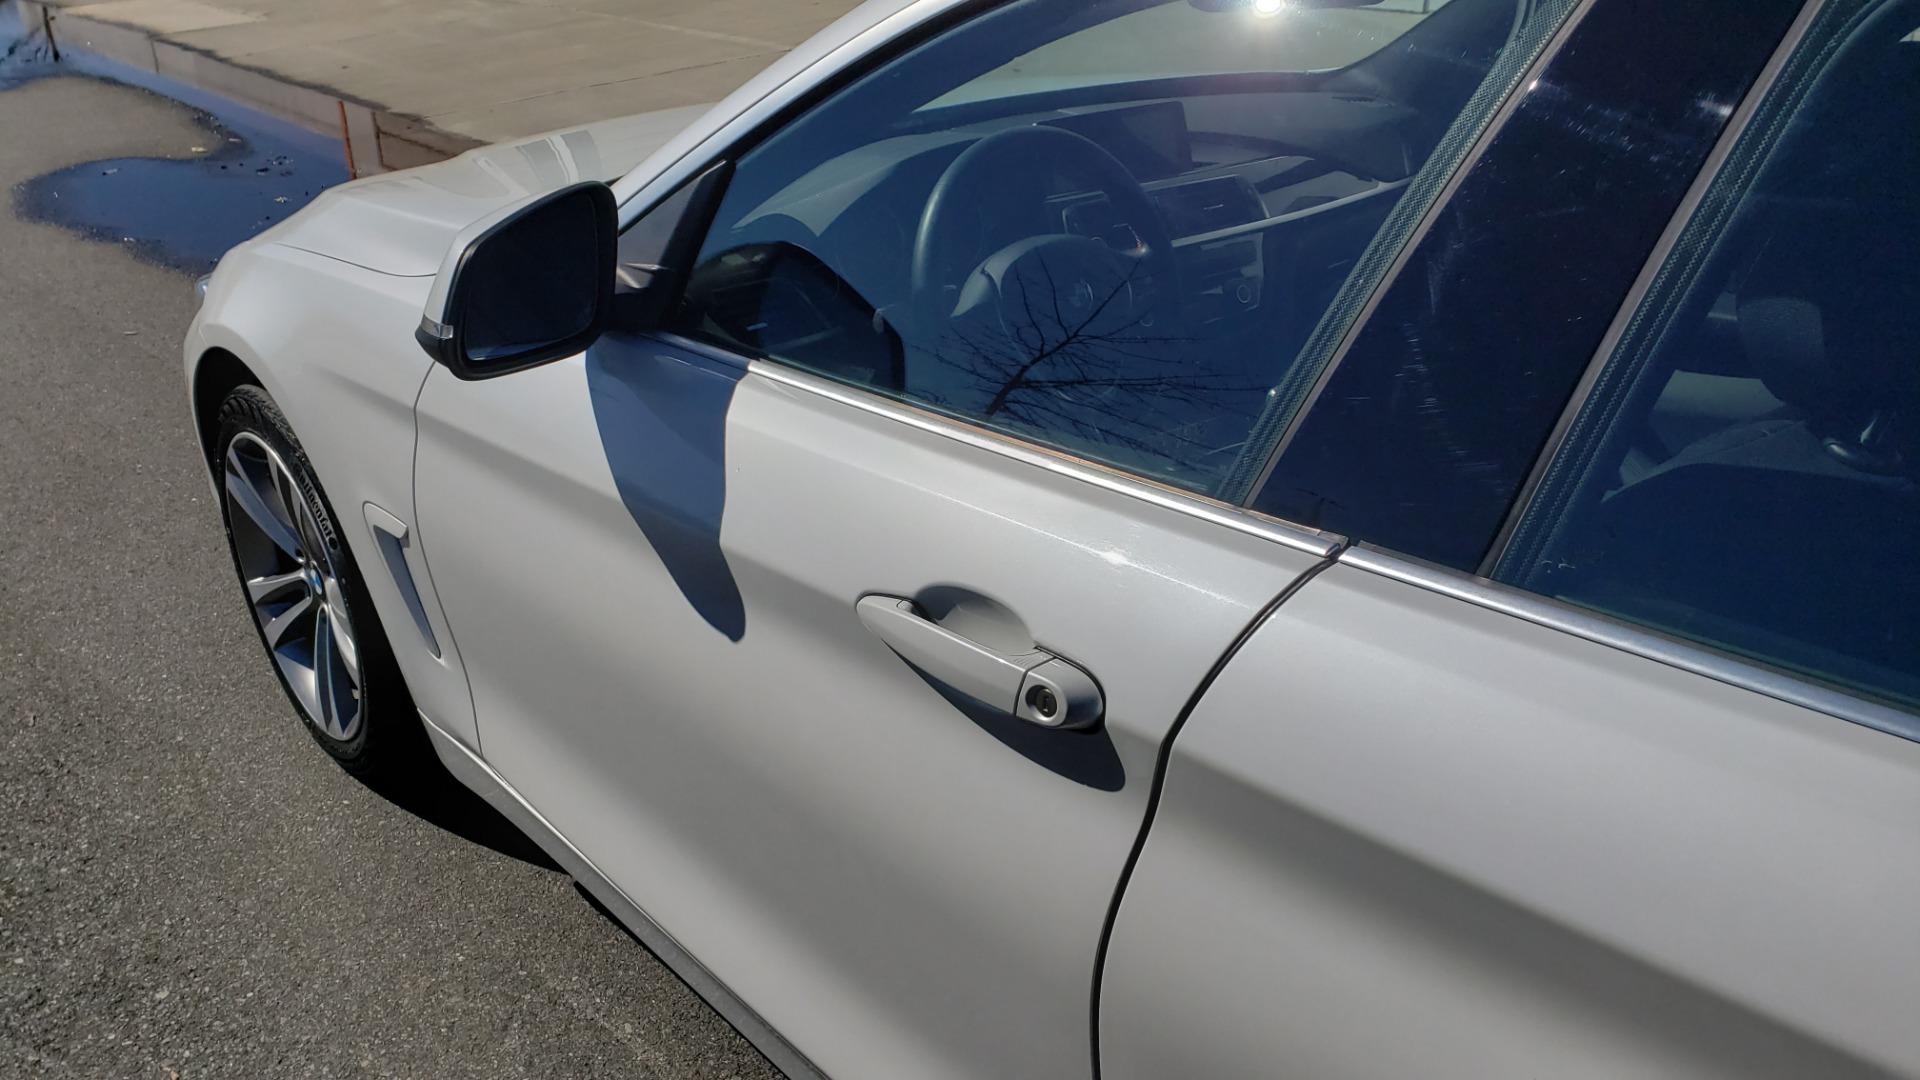 Used 2018 BMW 4 SERIES 430IXDRIVE / PREMIUM / NAV / SUNROOF / ESSENTIALS PKG for sale $27,795 at Formula Imports in Charlotte NC 28227 8